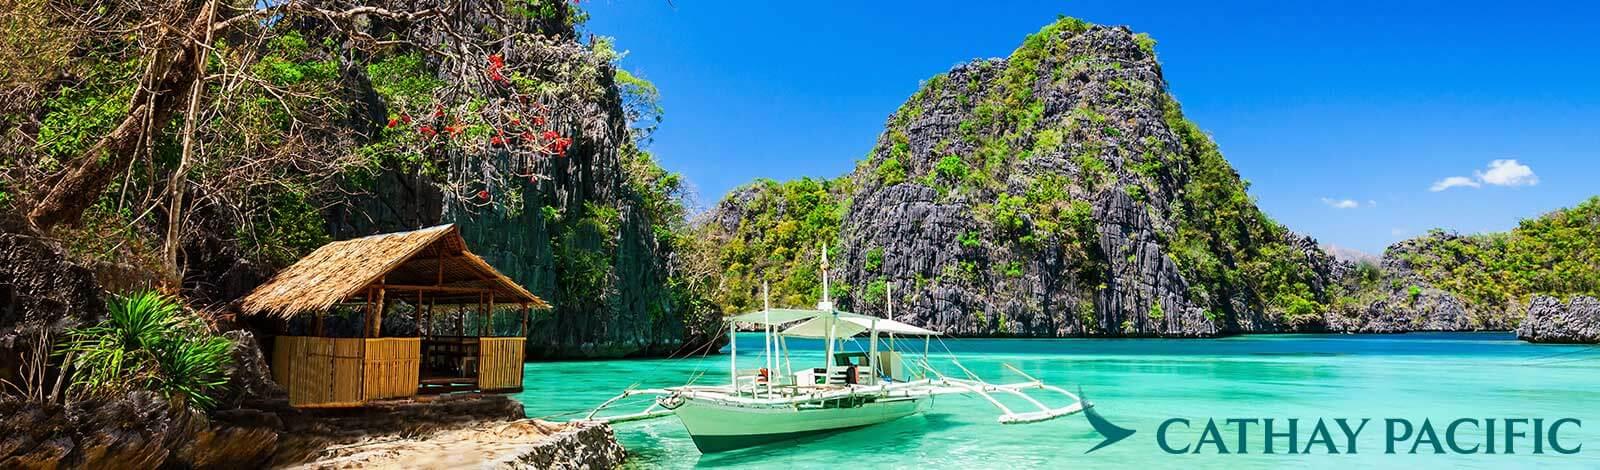 Cathay Pacific Filipijnen okt